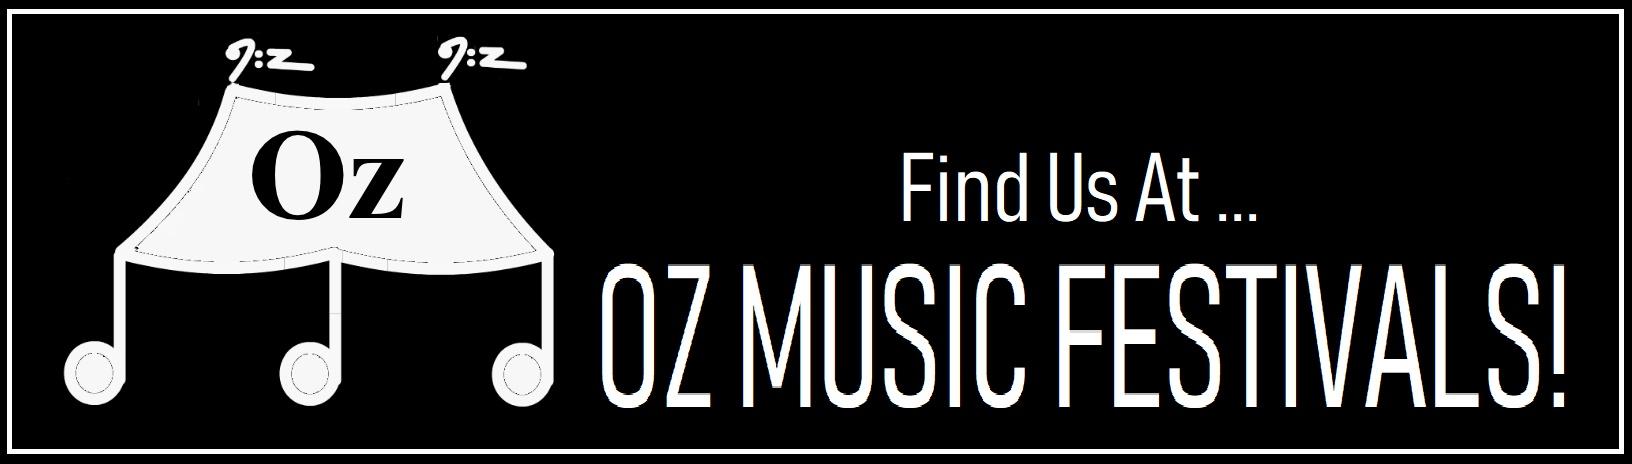 OzMFz_FindUsAtLogo_WhiteOnBlack.jpg